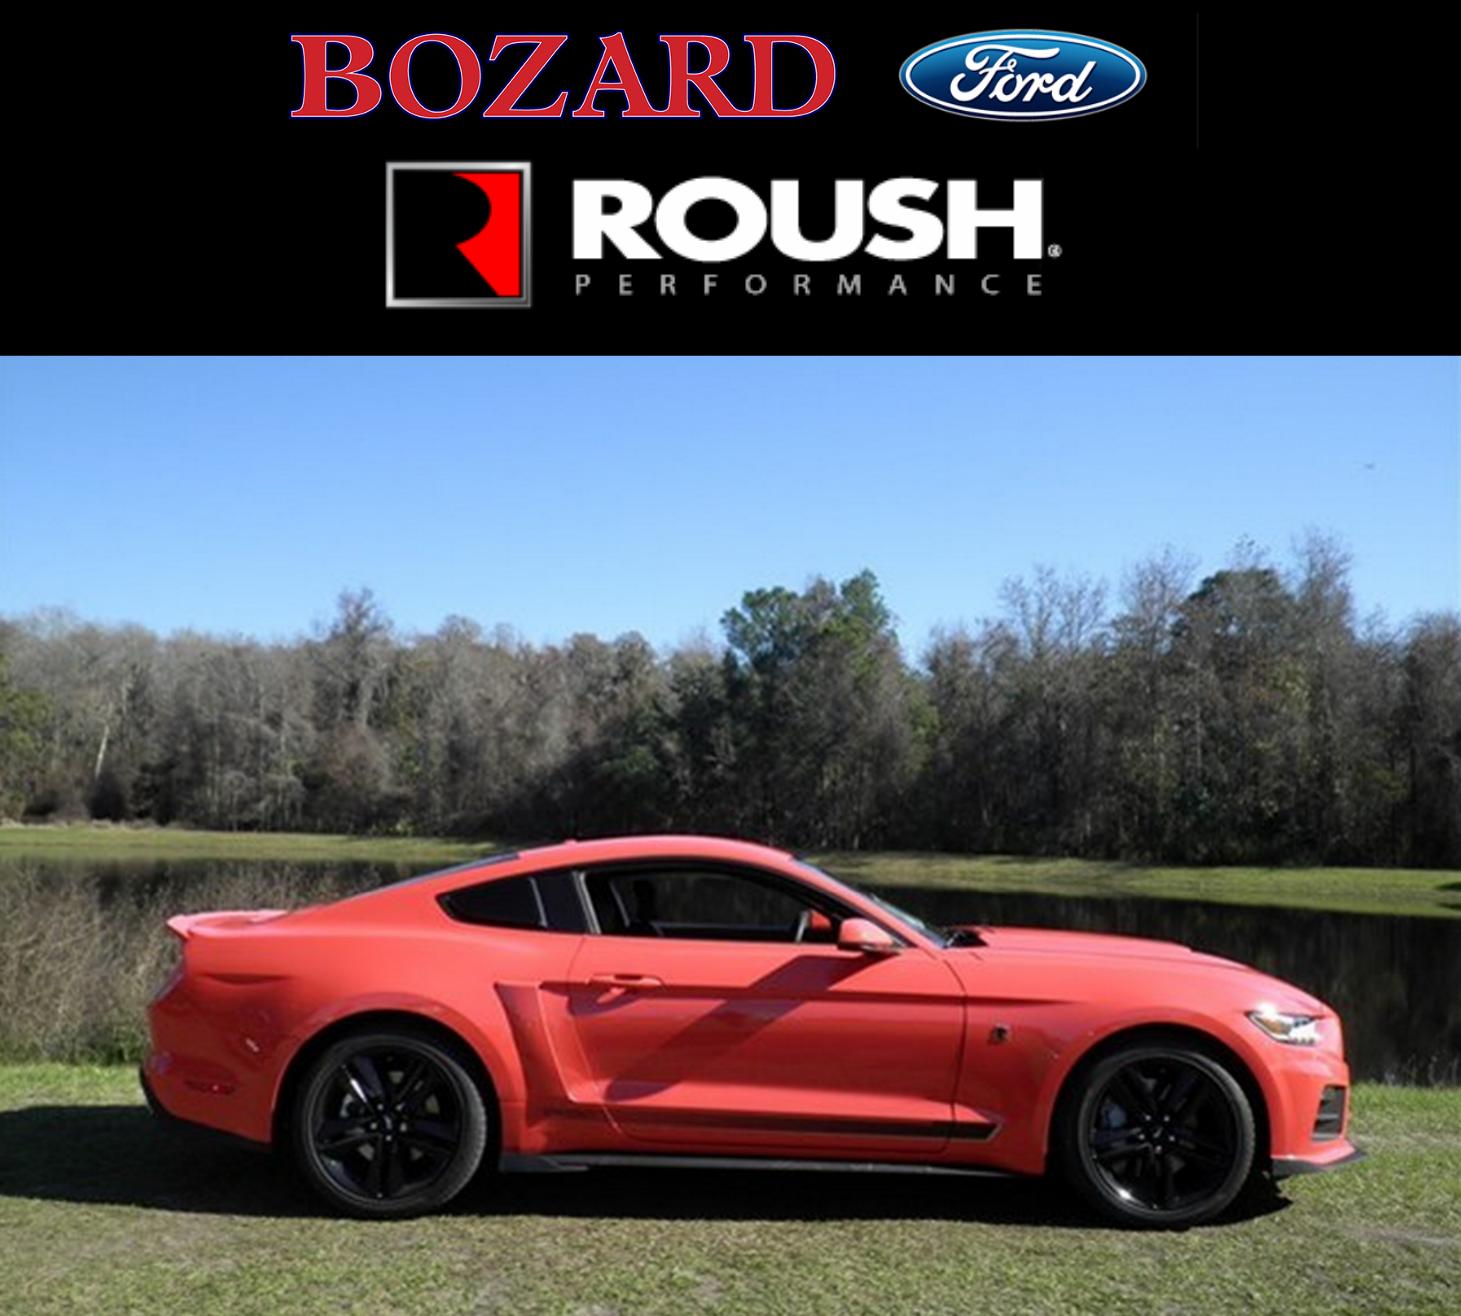 2015 roush mustang competition orange at bozard ford roush dealership near jacksonville fl http